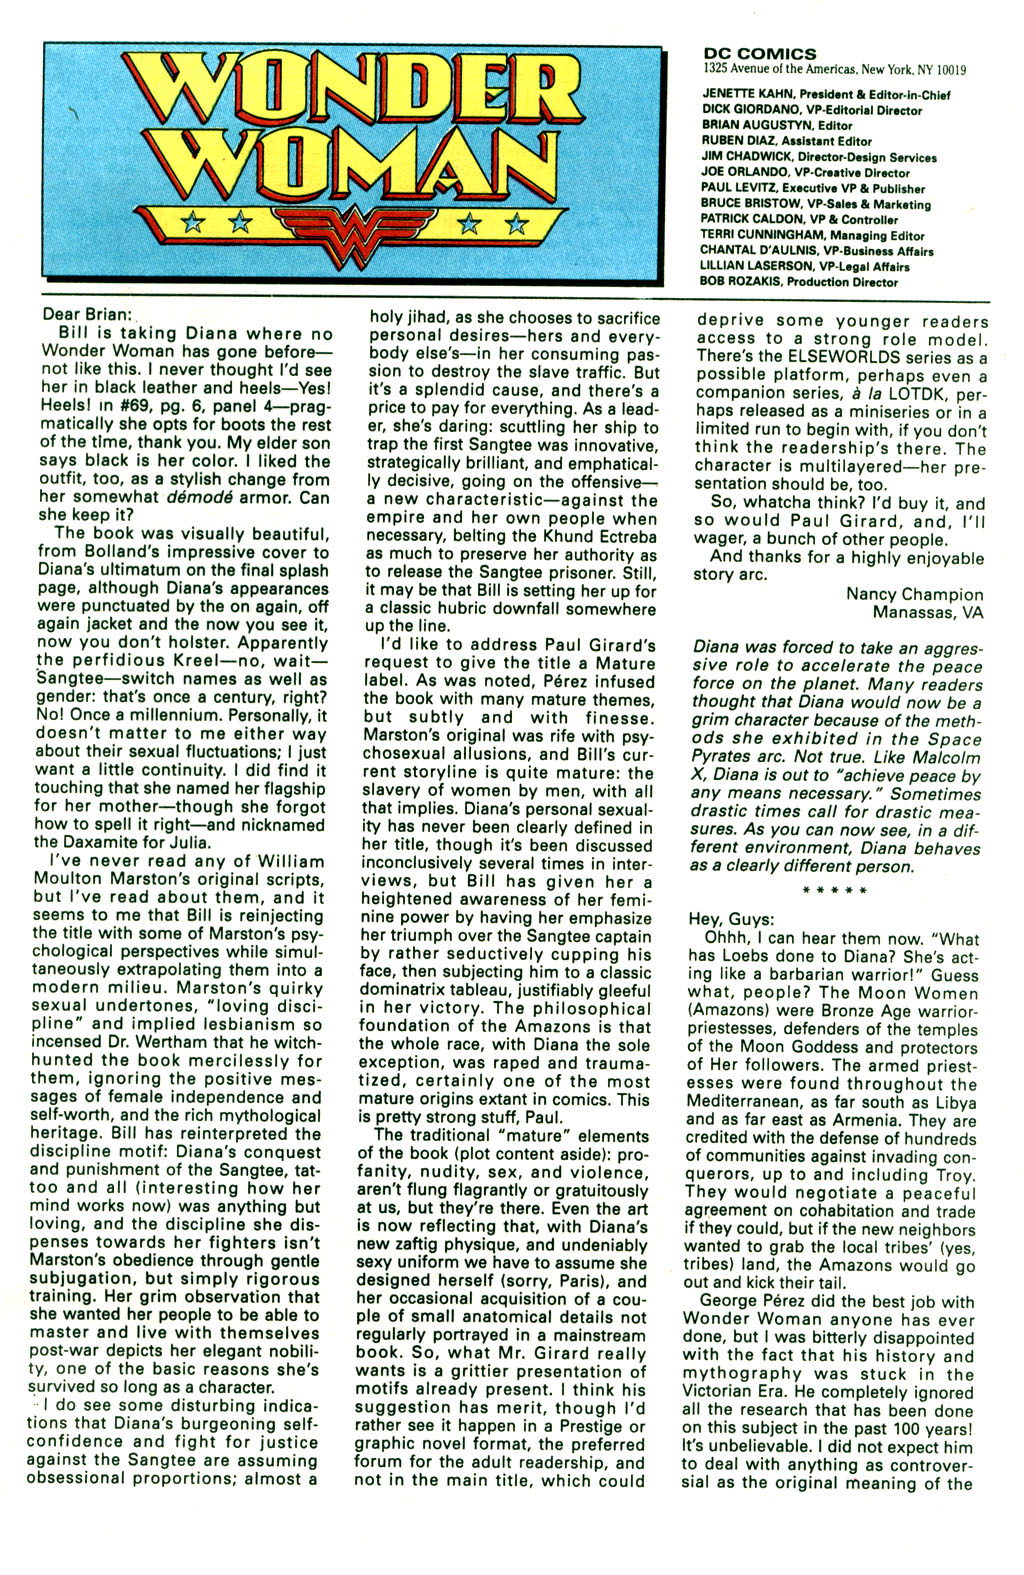 Read online Wonder Woman (1987) comic -  Issue #73 - 25